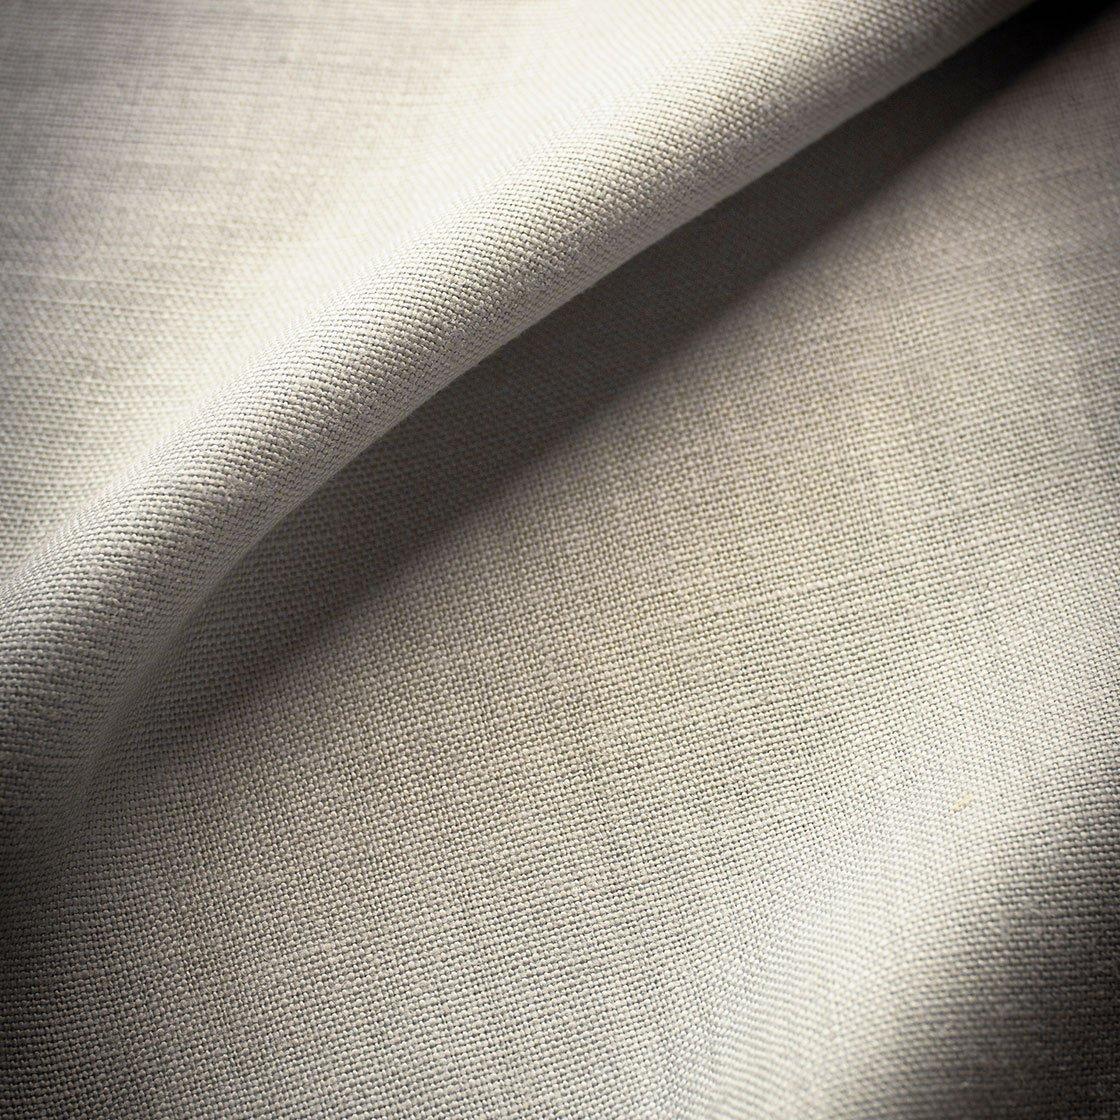 Bantry Linen - Stone - Beaumont & Fletcher - Beaumont & Fletcher